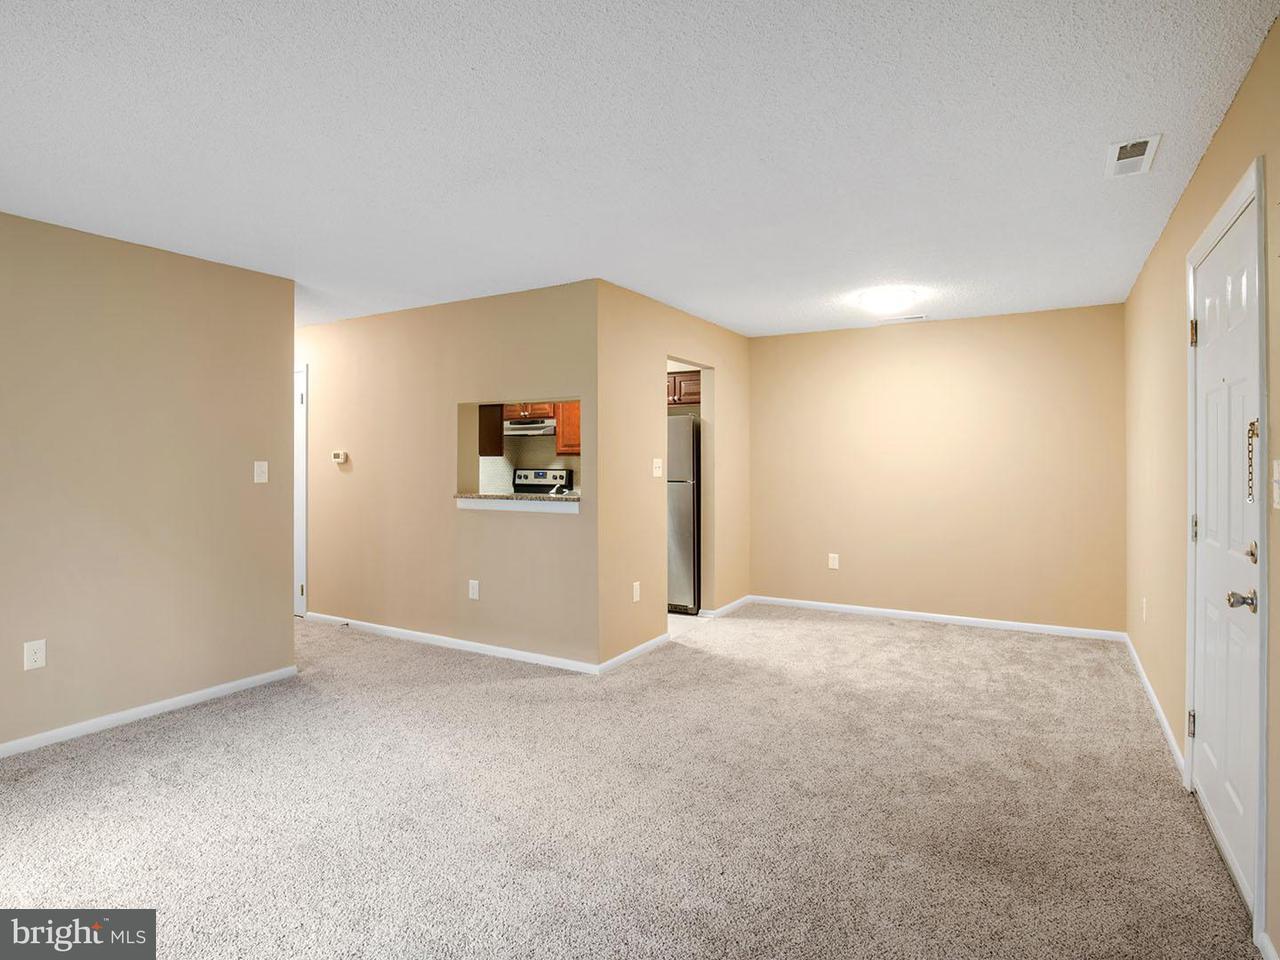 Casa Unifamiliar por un Alquiler en 2014 RAVENS CREST Drive Plainsboro, Nueva Jersey 08536 Estados UnidosEn/Alrededor: Plainsboro Township